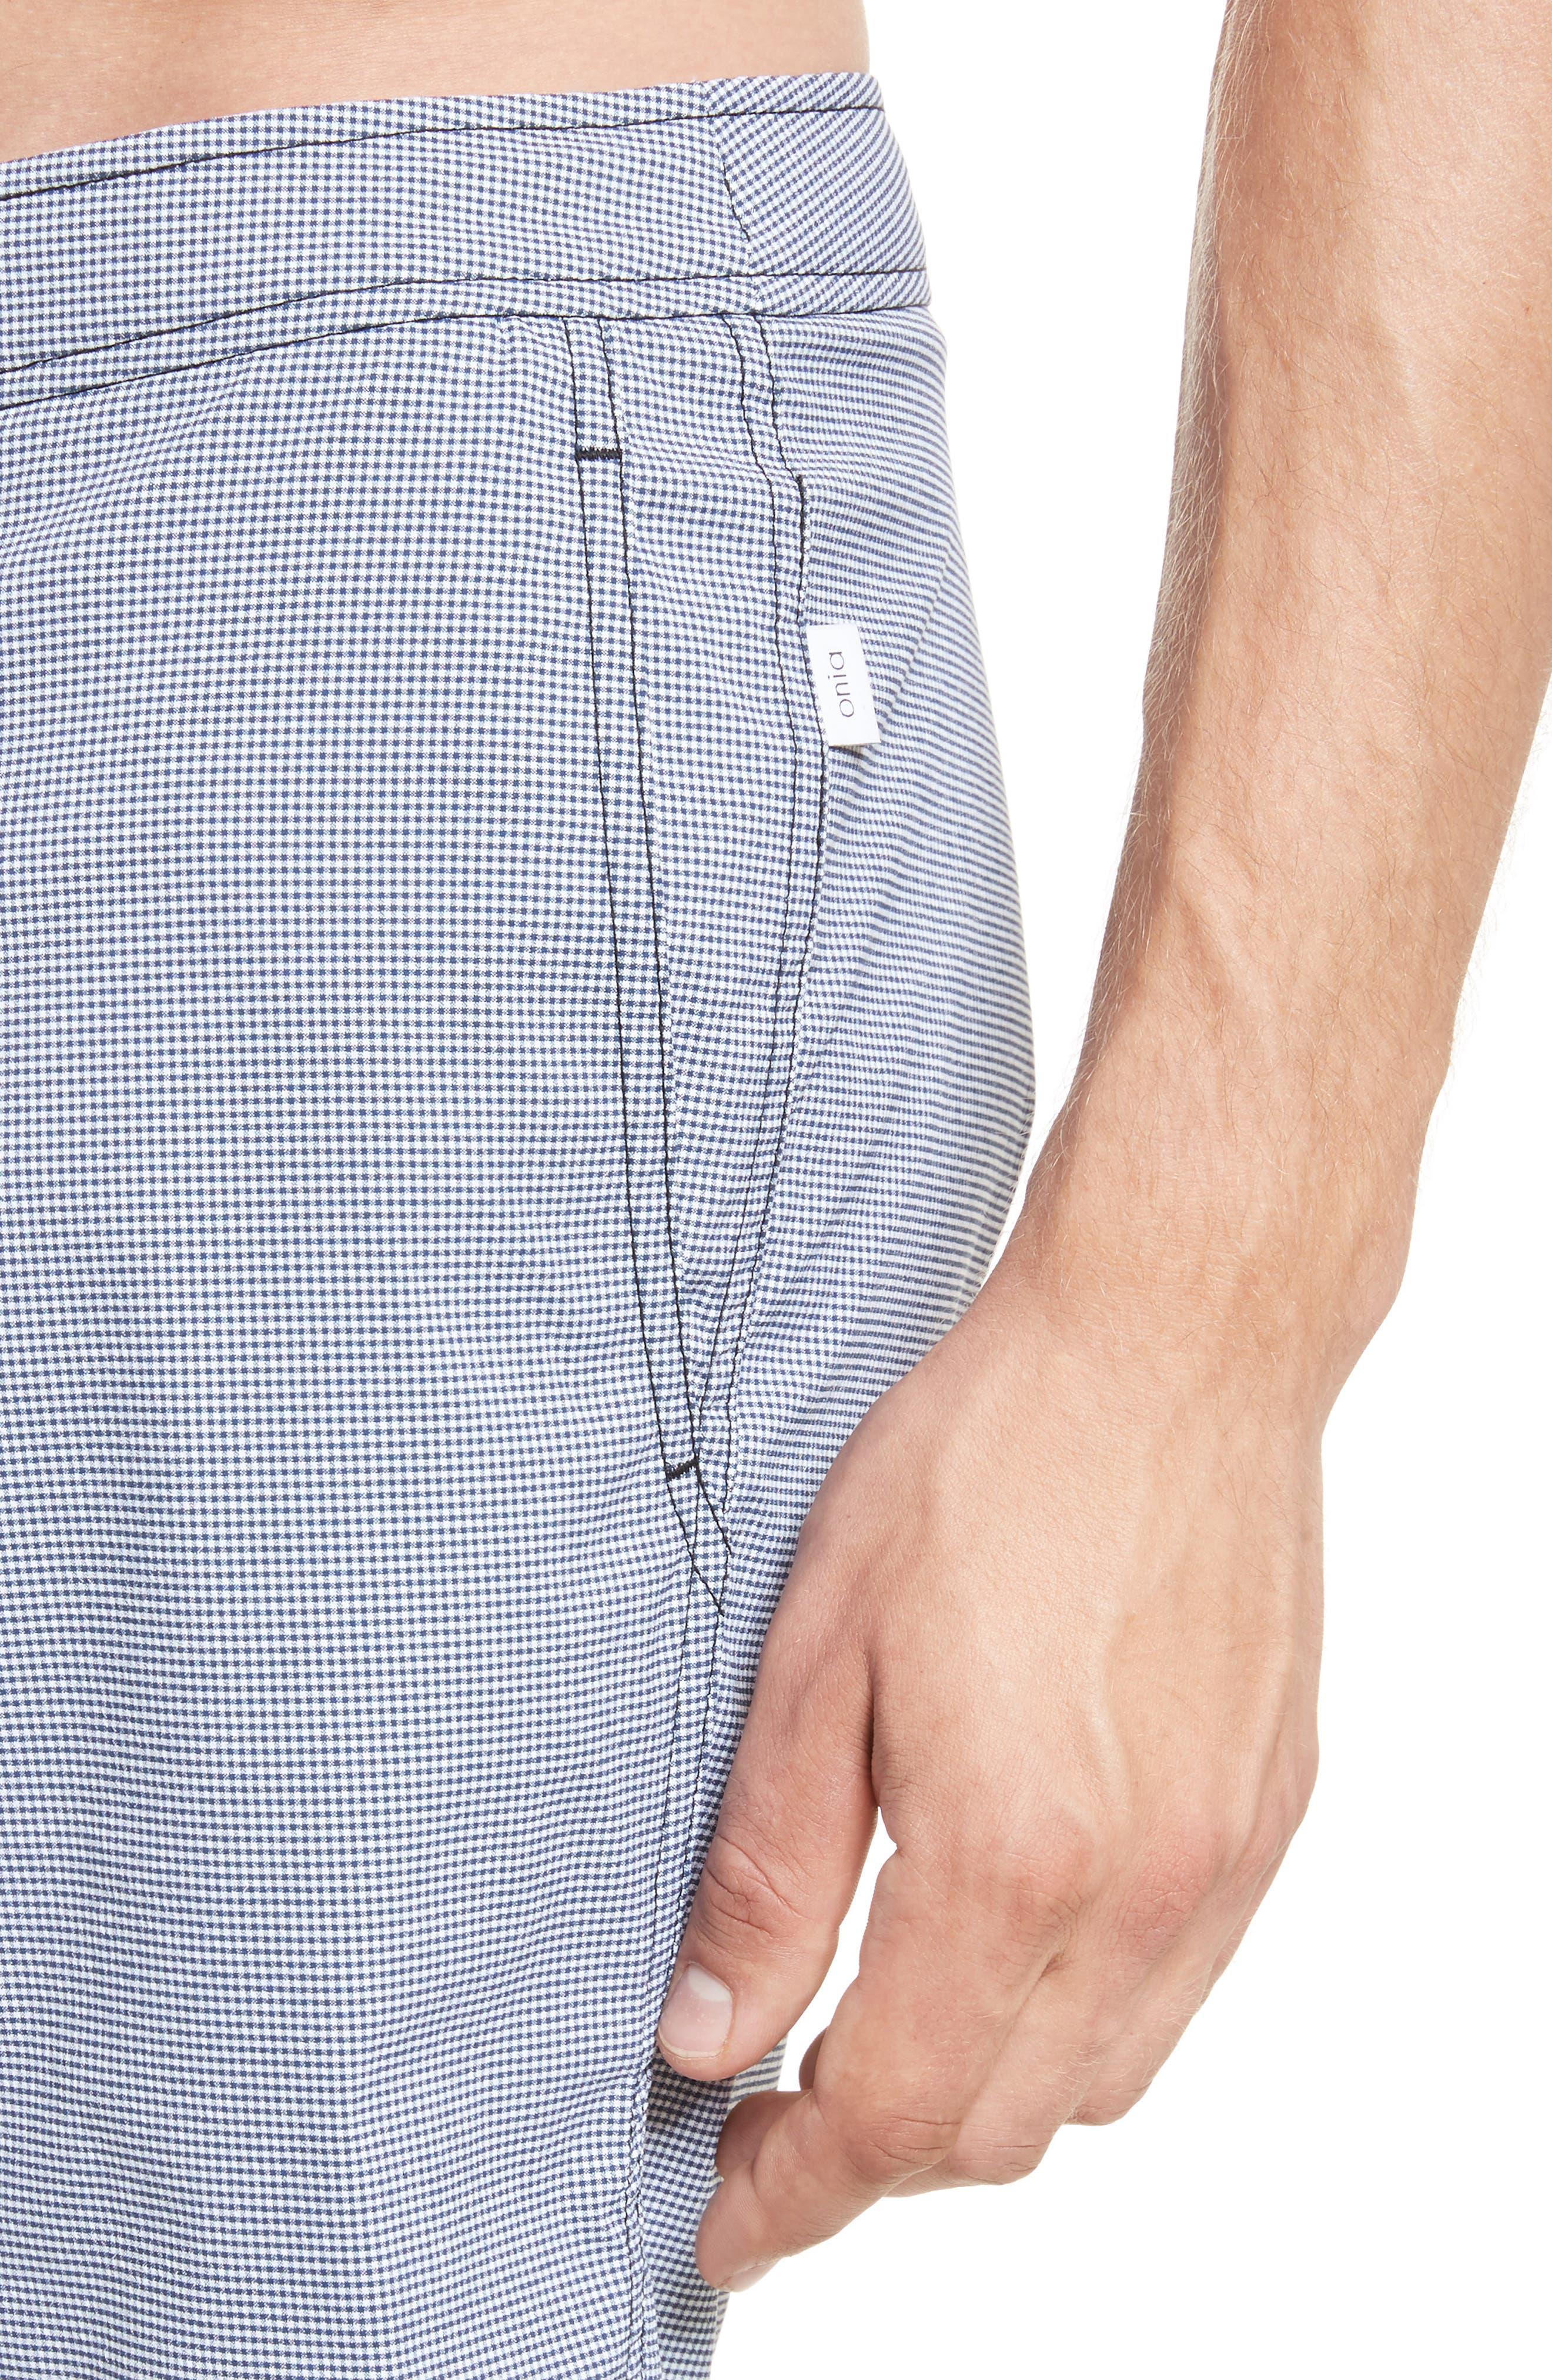 Calder Gingham Board Shorts,                             Alternate thumbnail 4, color,                             Deep Navy/White